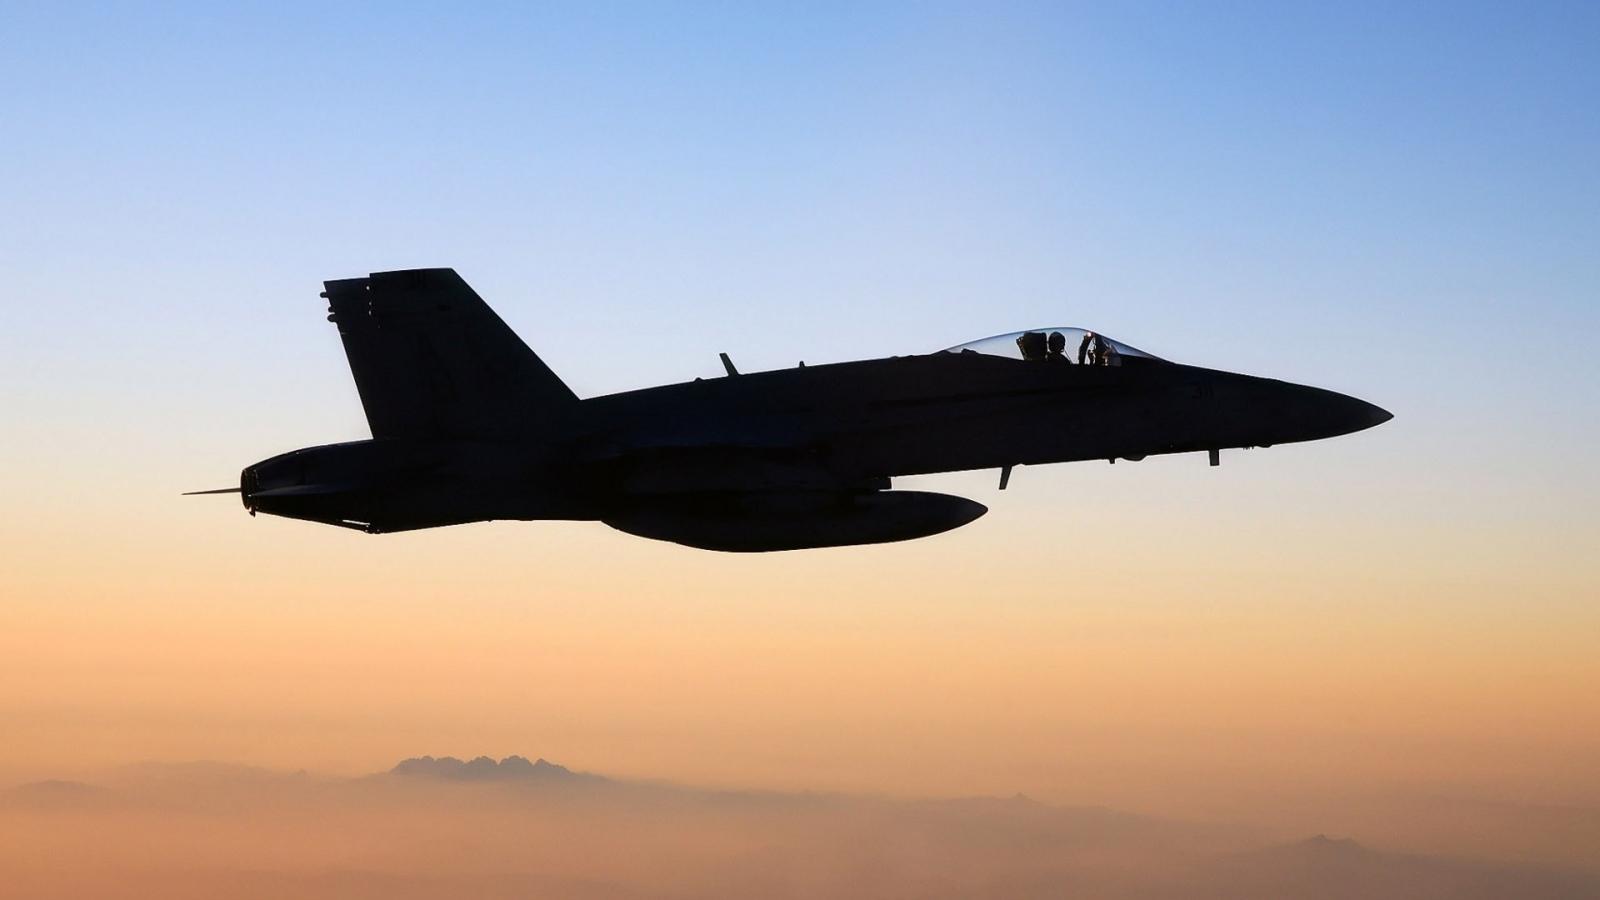 FA-18 Hornet - 1600x900